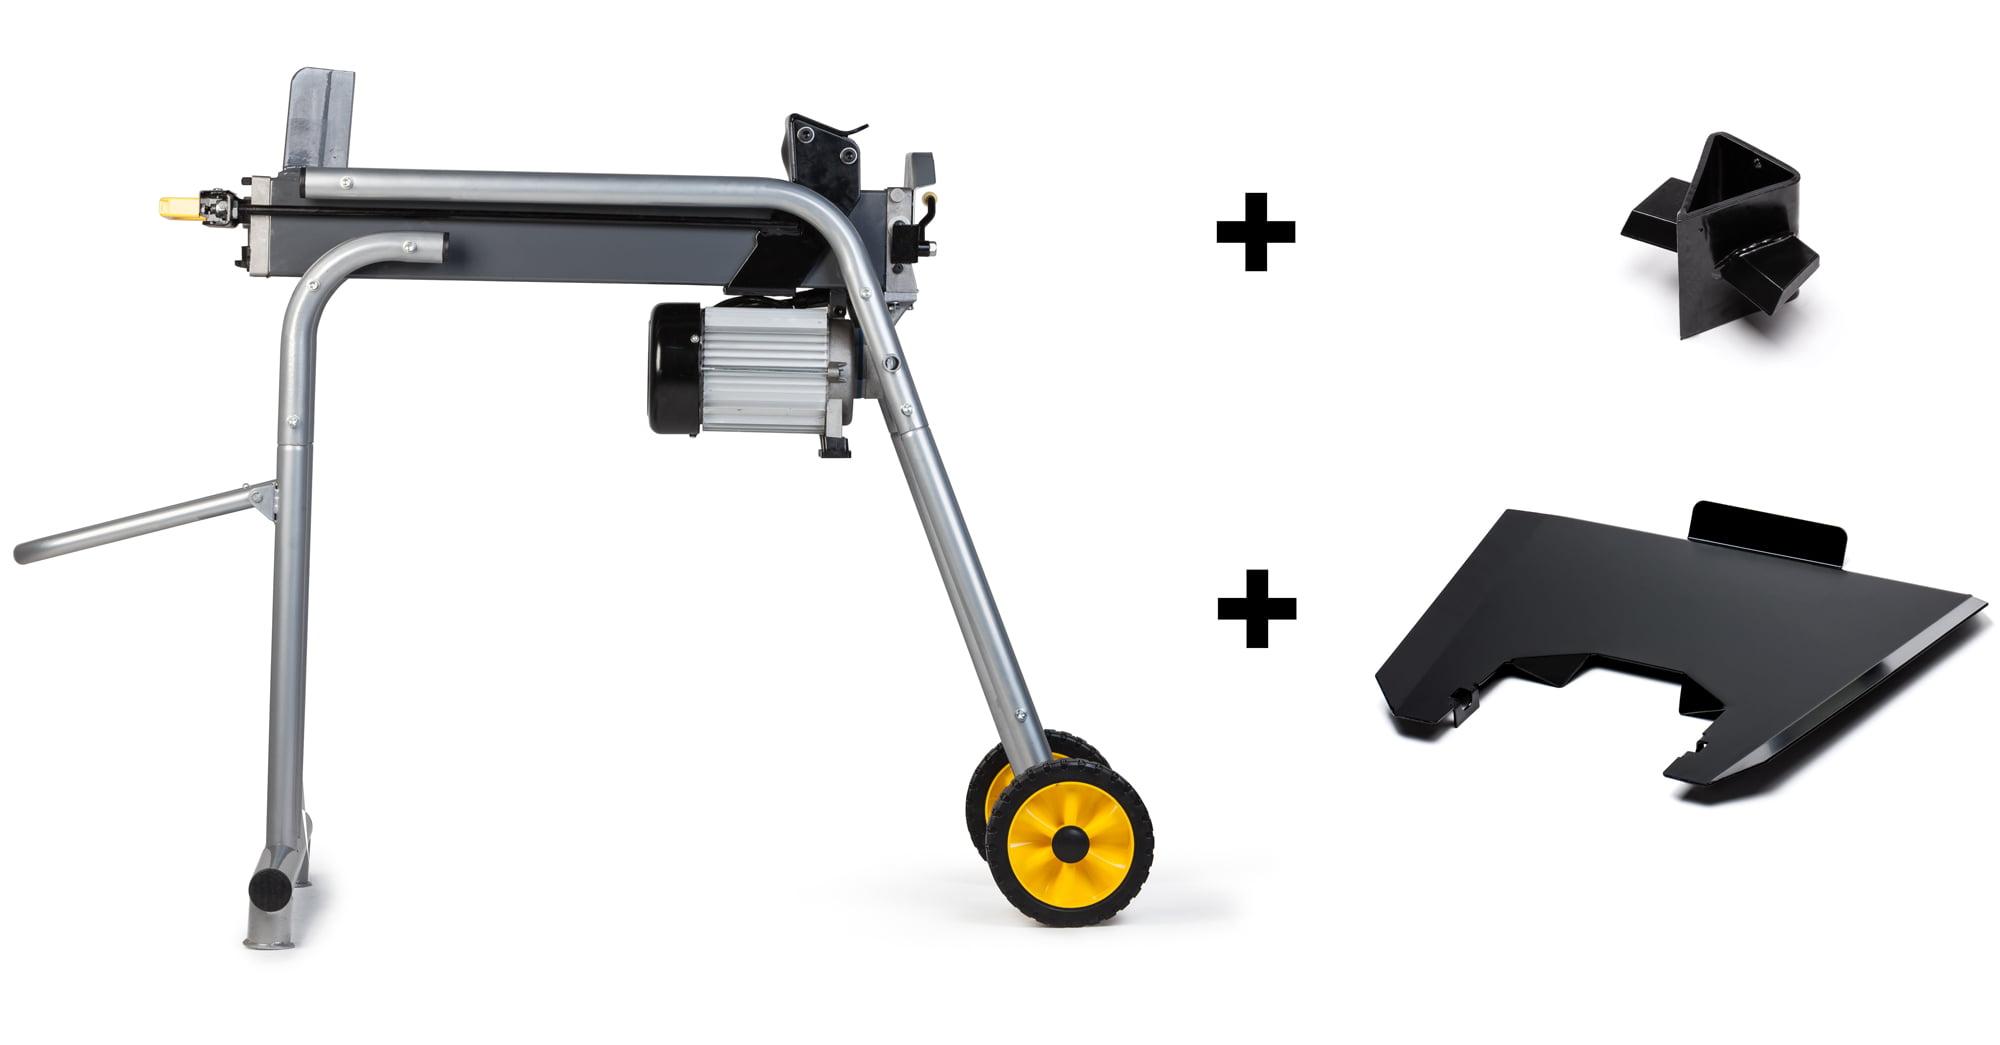 TR Industrial 89130 1800W Electric Log Splitter W Ergonomic Stand + Tray + 4-way Cross... by TR Industrial